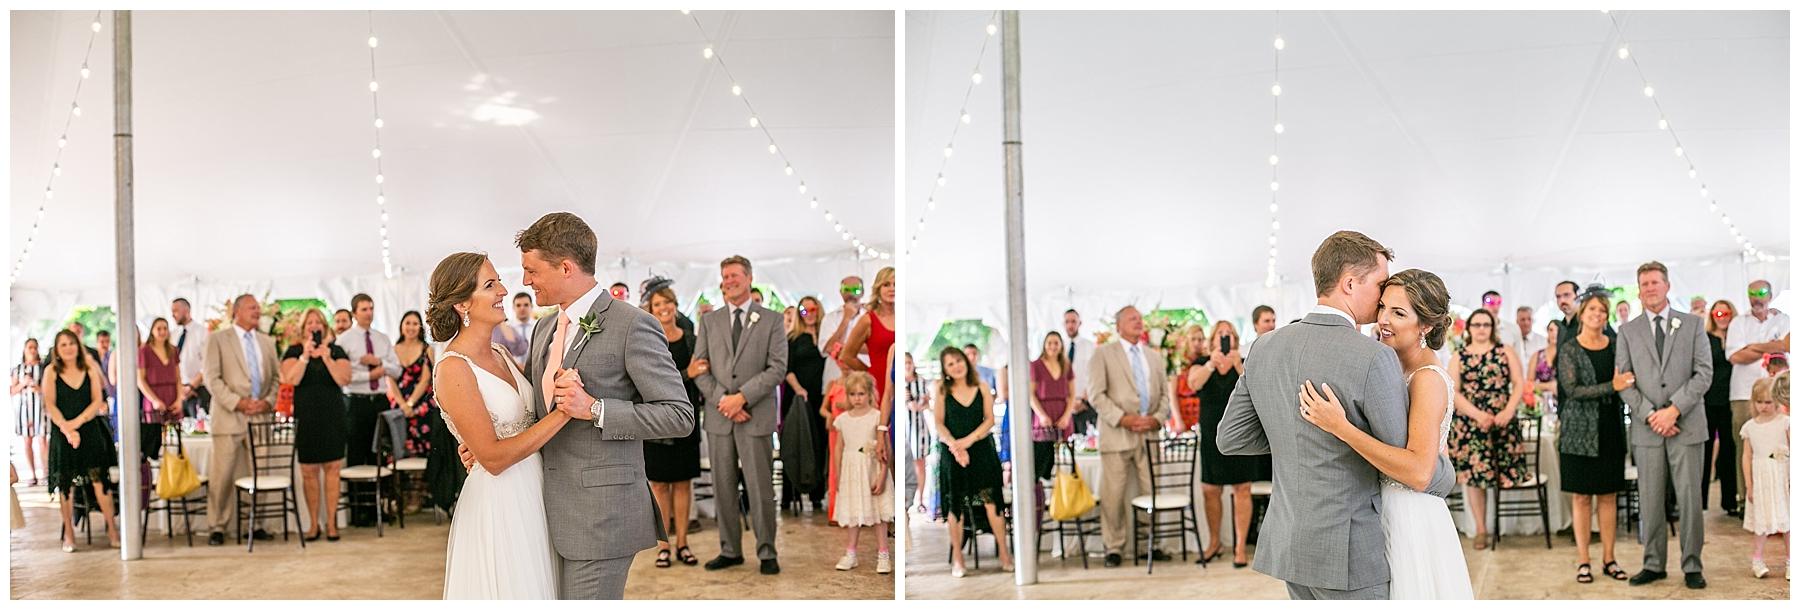 Chelsea Phil Bohemia River Overlook Wedding Living Radiant Photography photos_0135.jpg